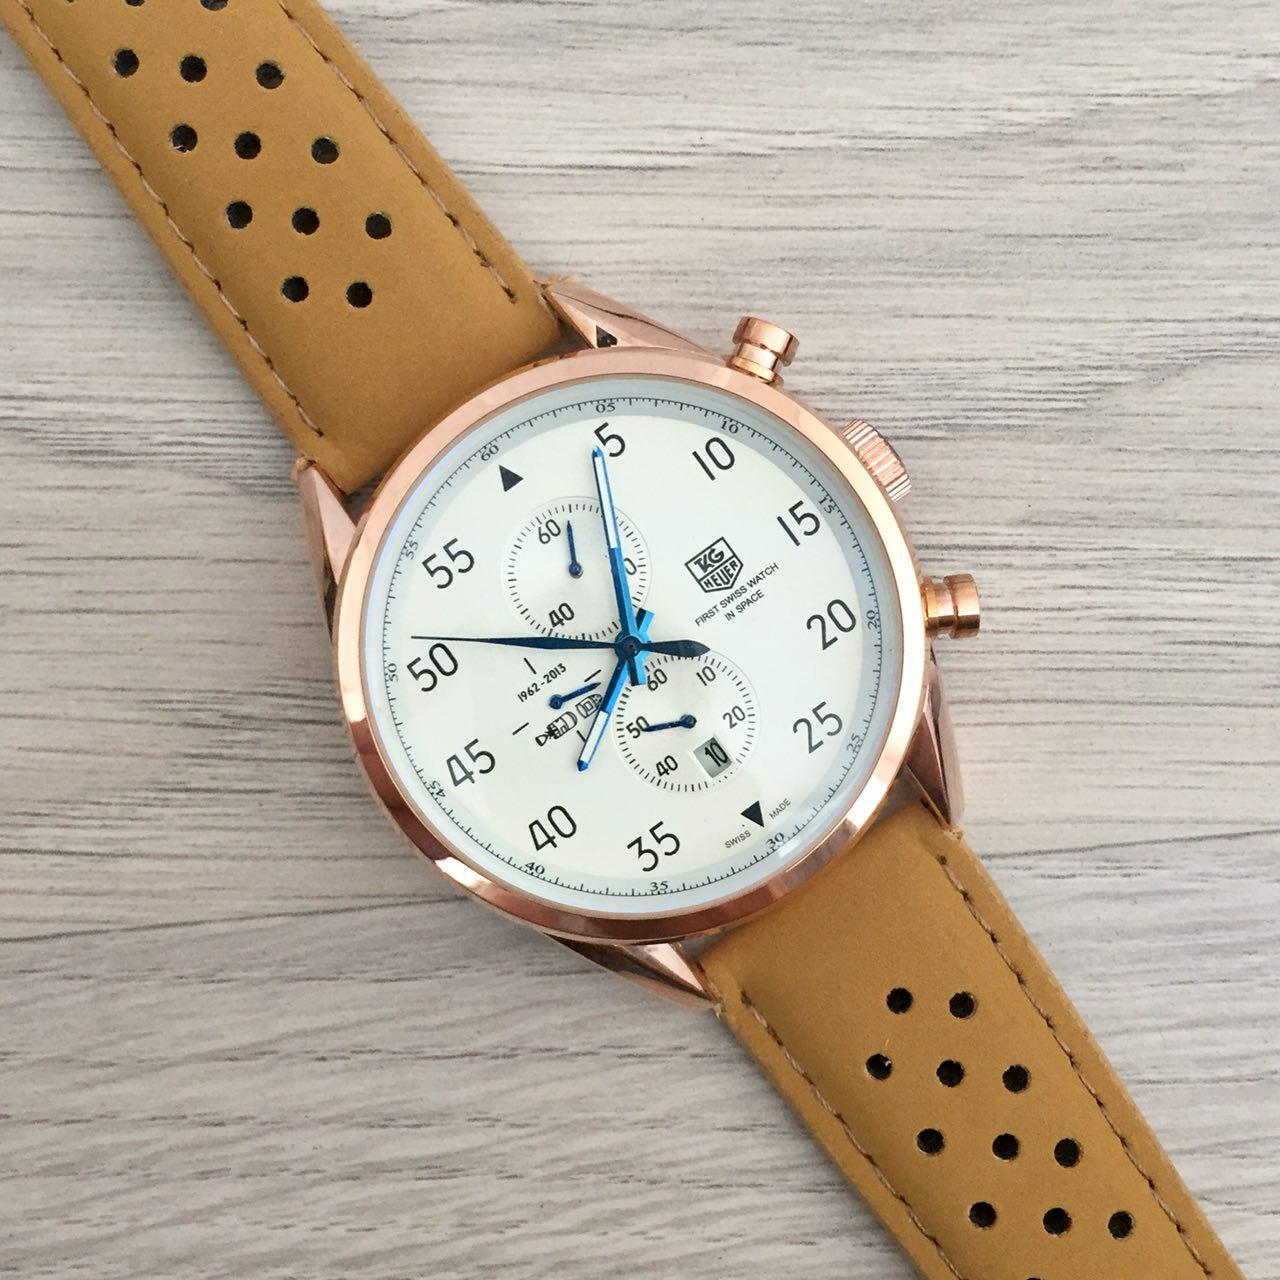 Наручные мужские часы TAG Heuer Carrera 1887 SpaceX Mechanic Gold-White CL